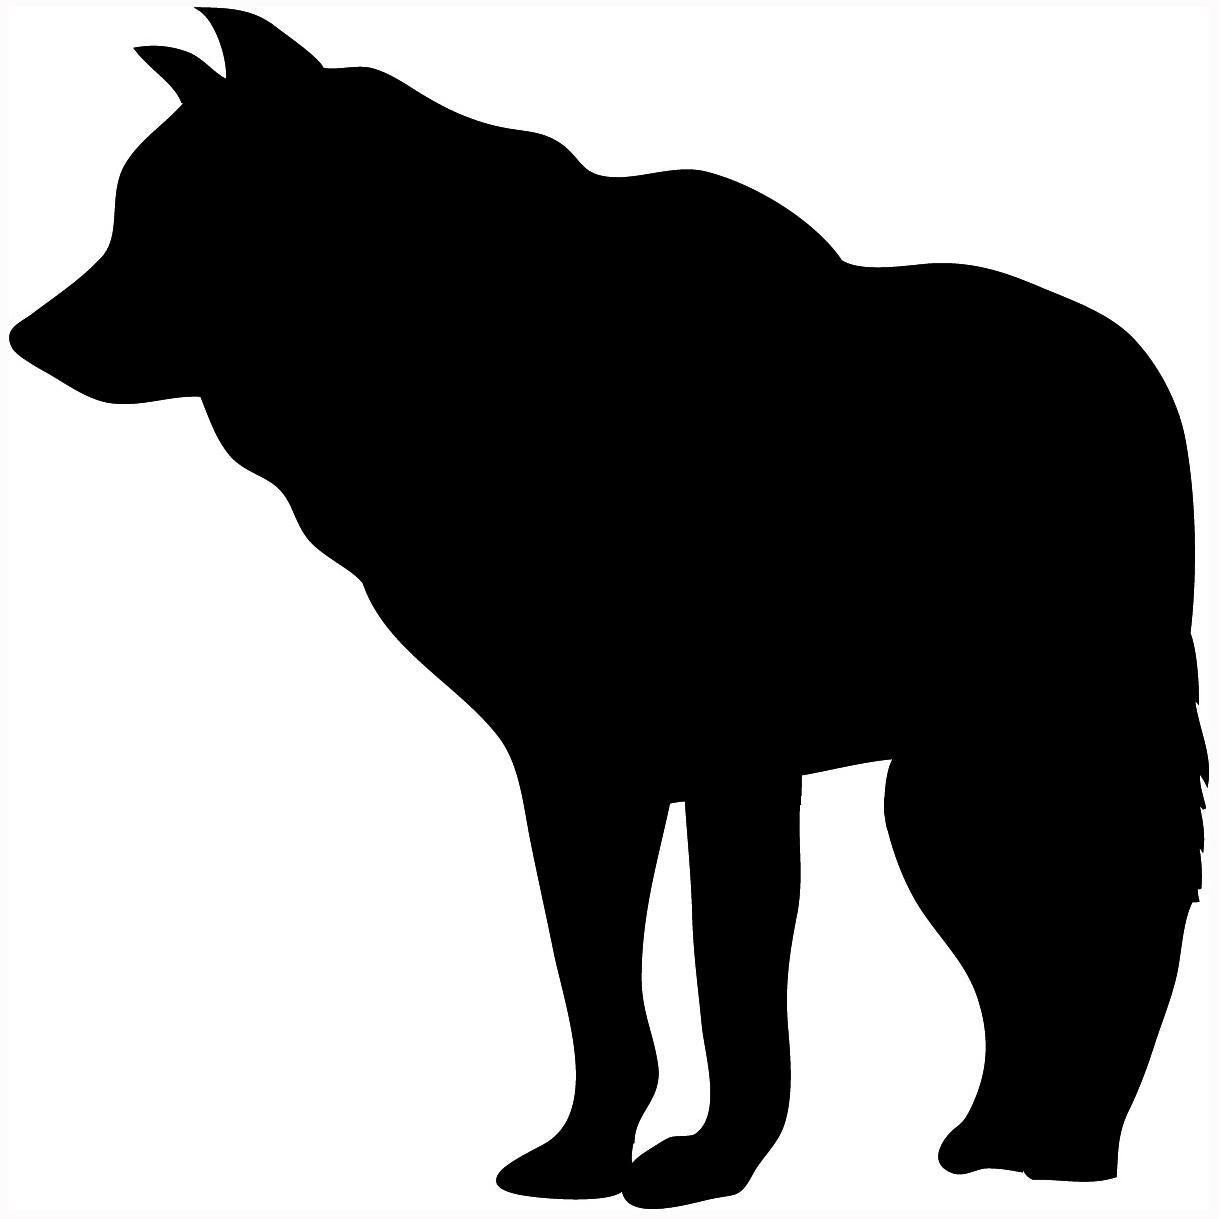 Wolf Silhouette Clip Art - Wolf Silhouette Clip Art